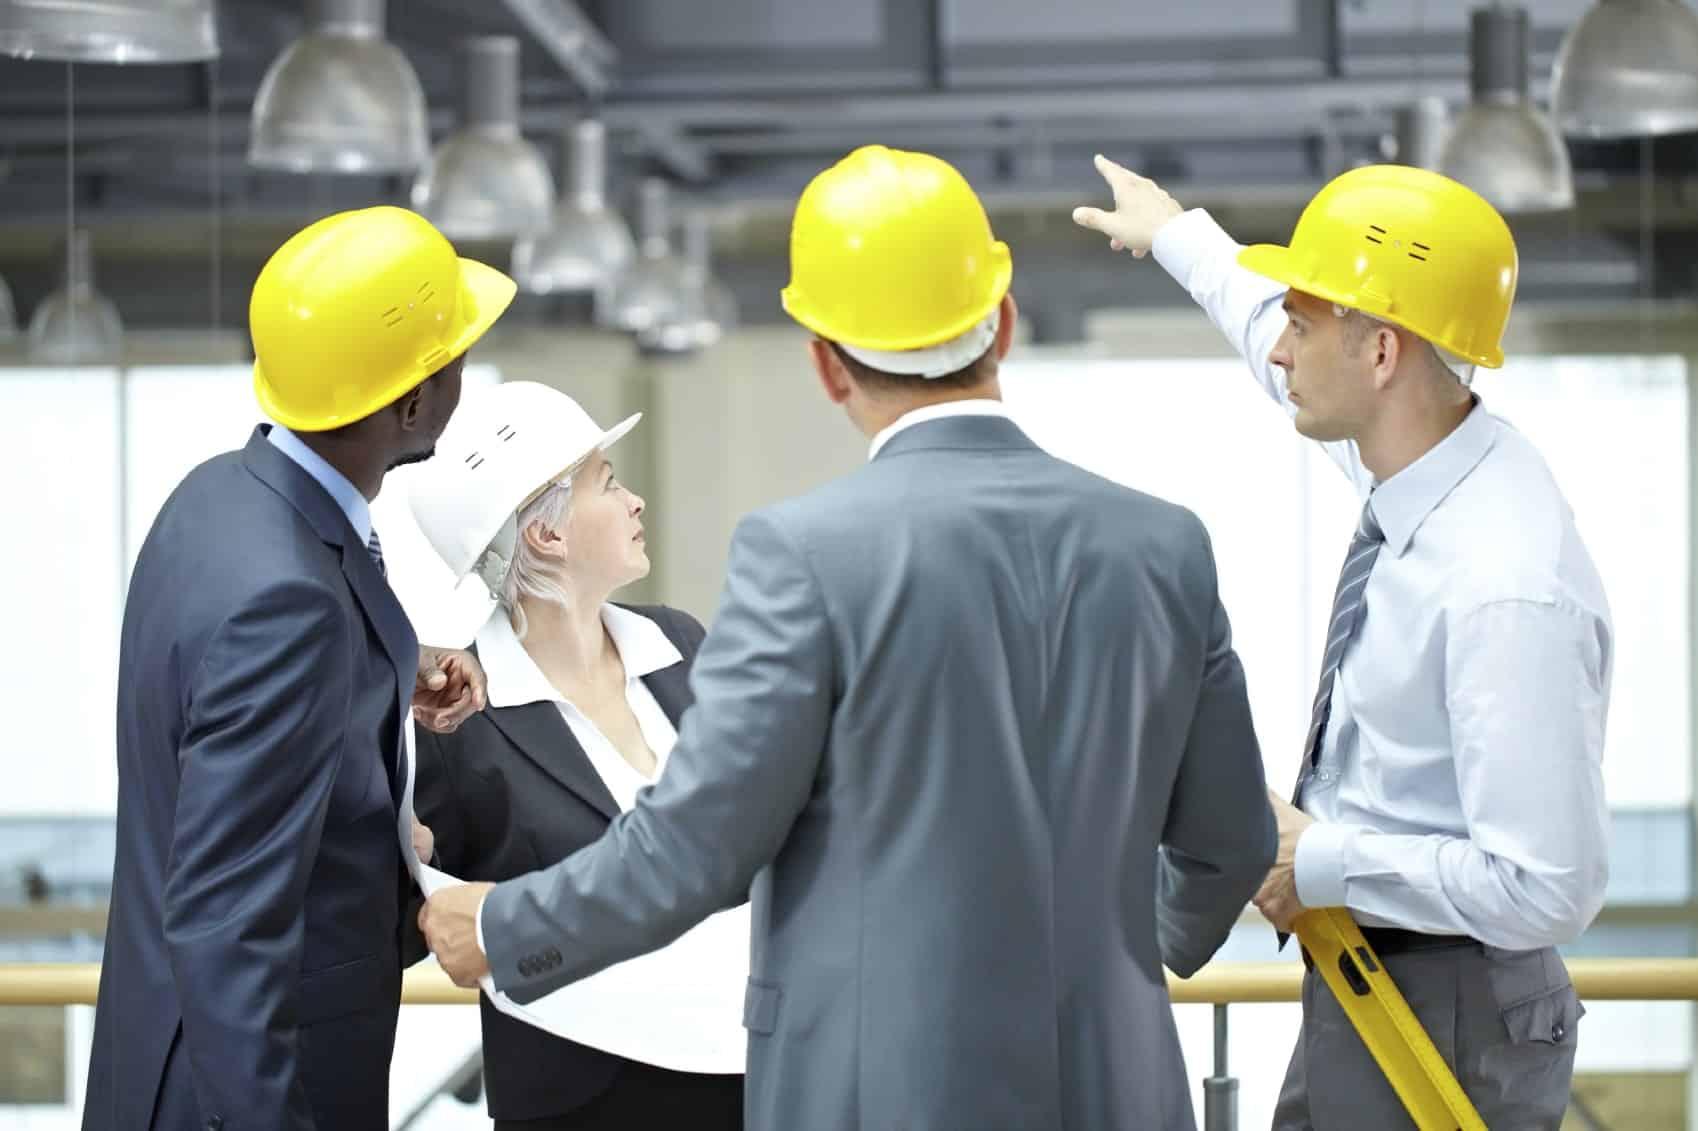 protectia muncii dupa deschiderea unei firme